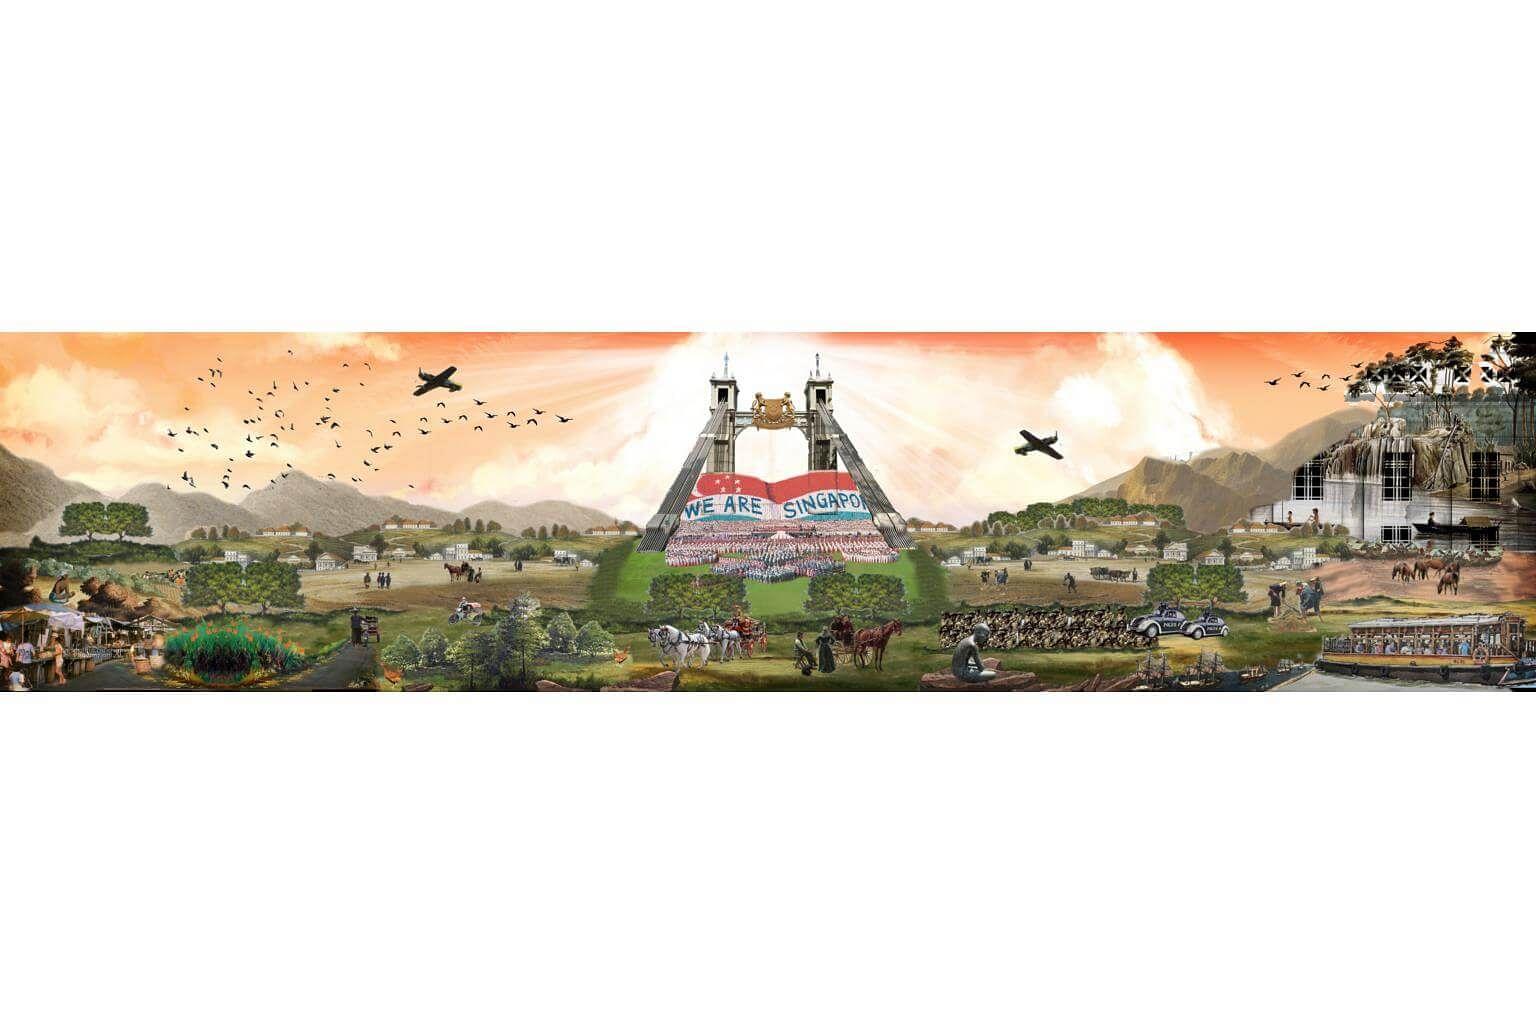 Singapore's Bicentennial Calendar: Journeying back 700 years